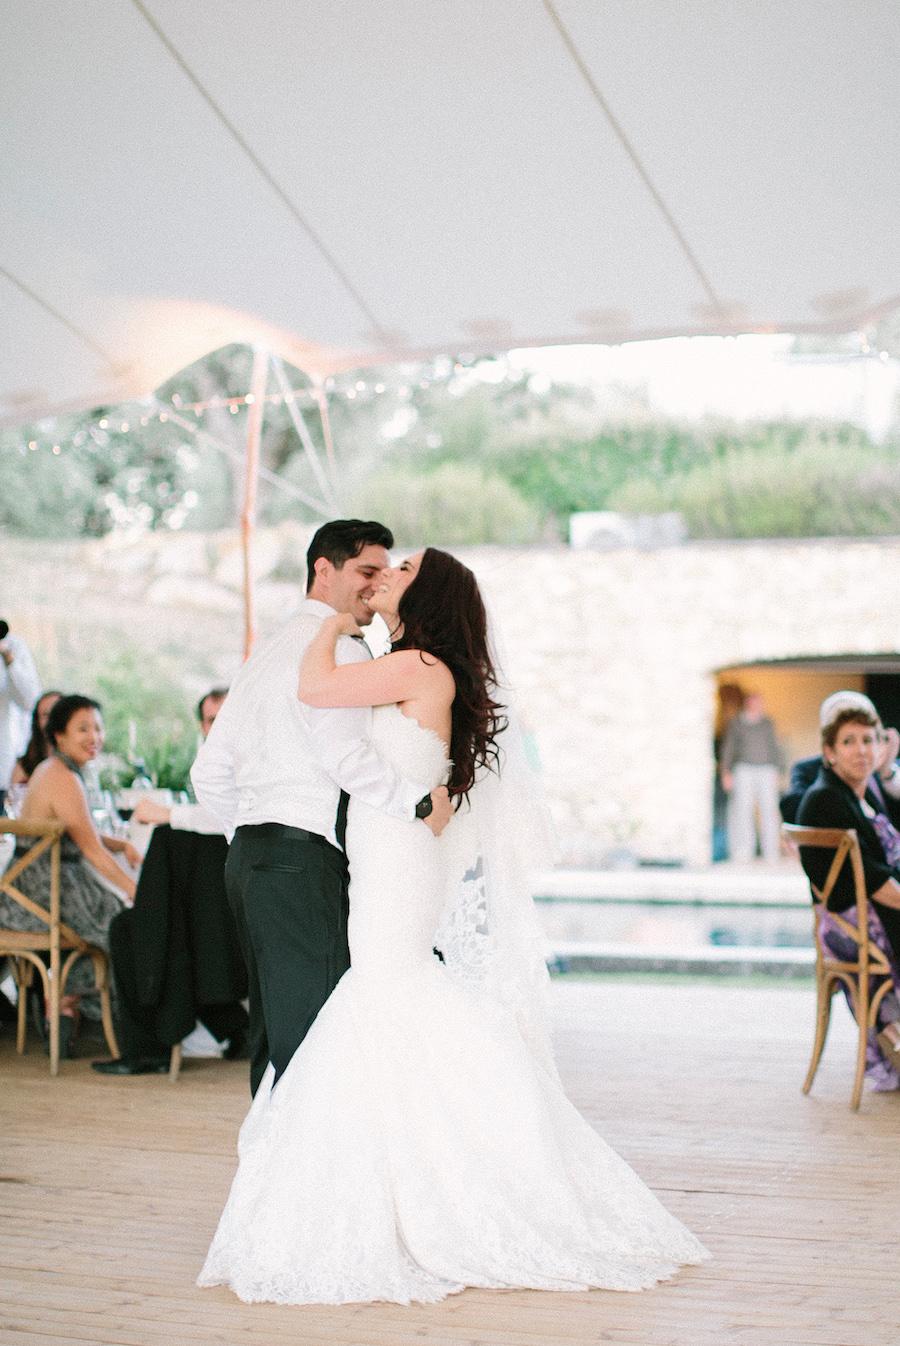 saya-photography-jewish-wedding-provence-rustic-lourmarin-le-galinier-52.jpg